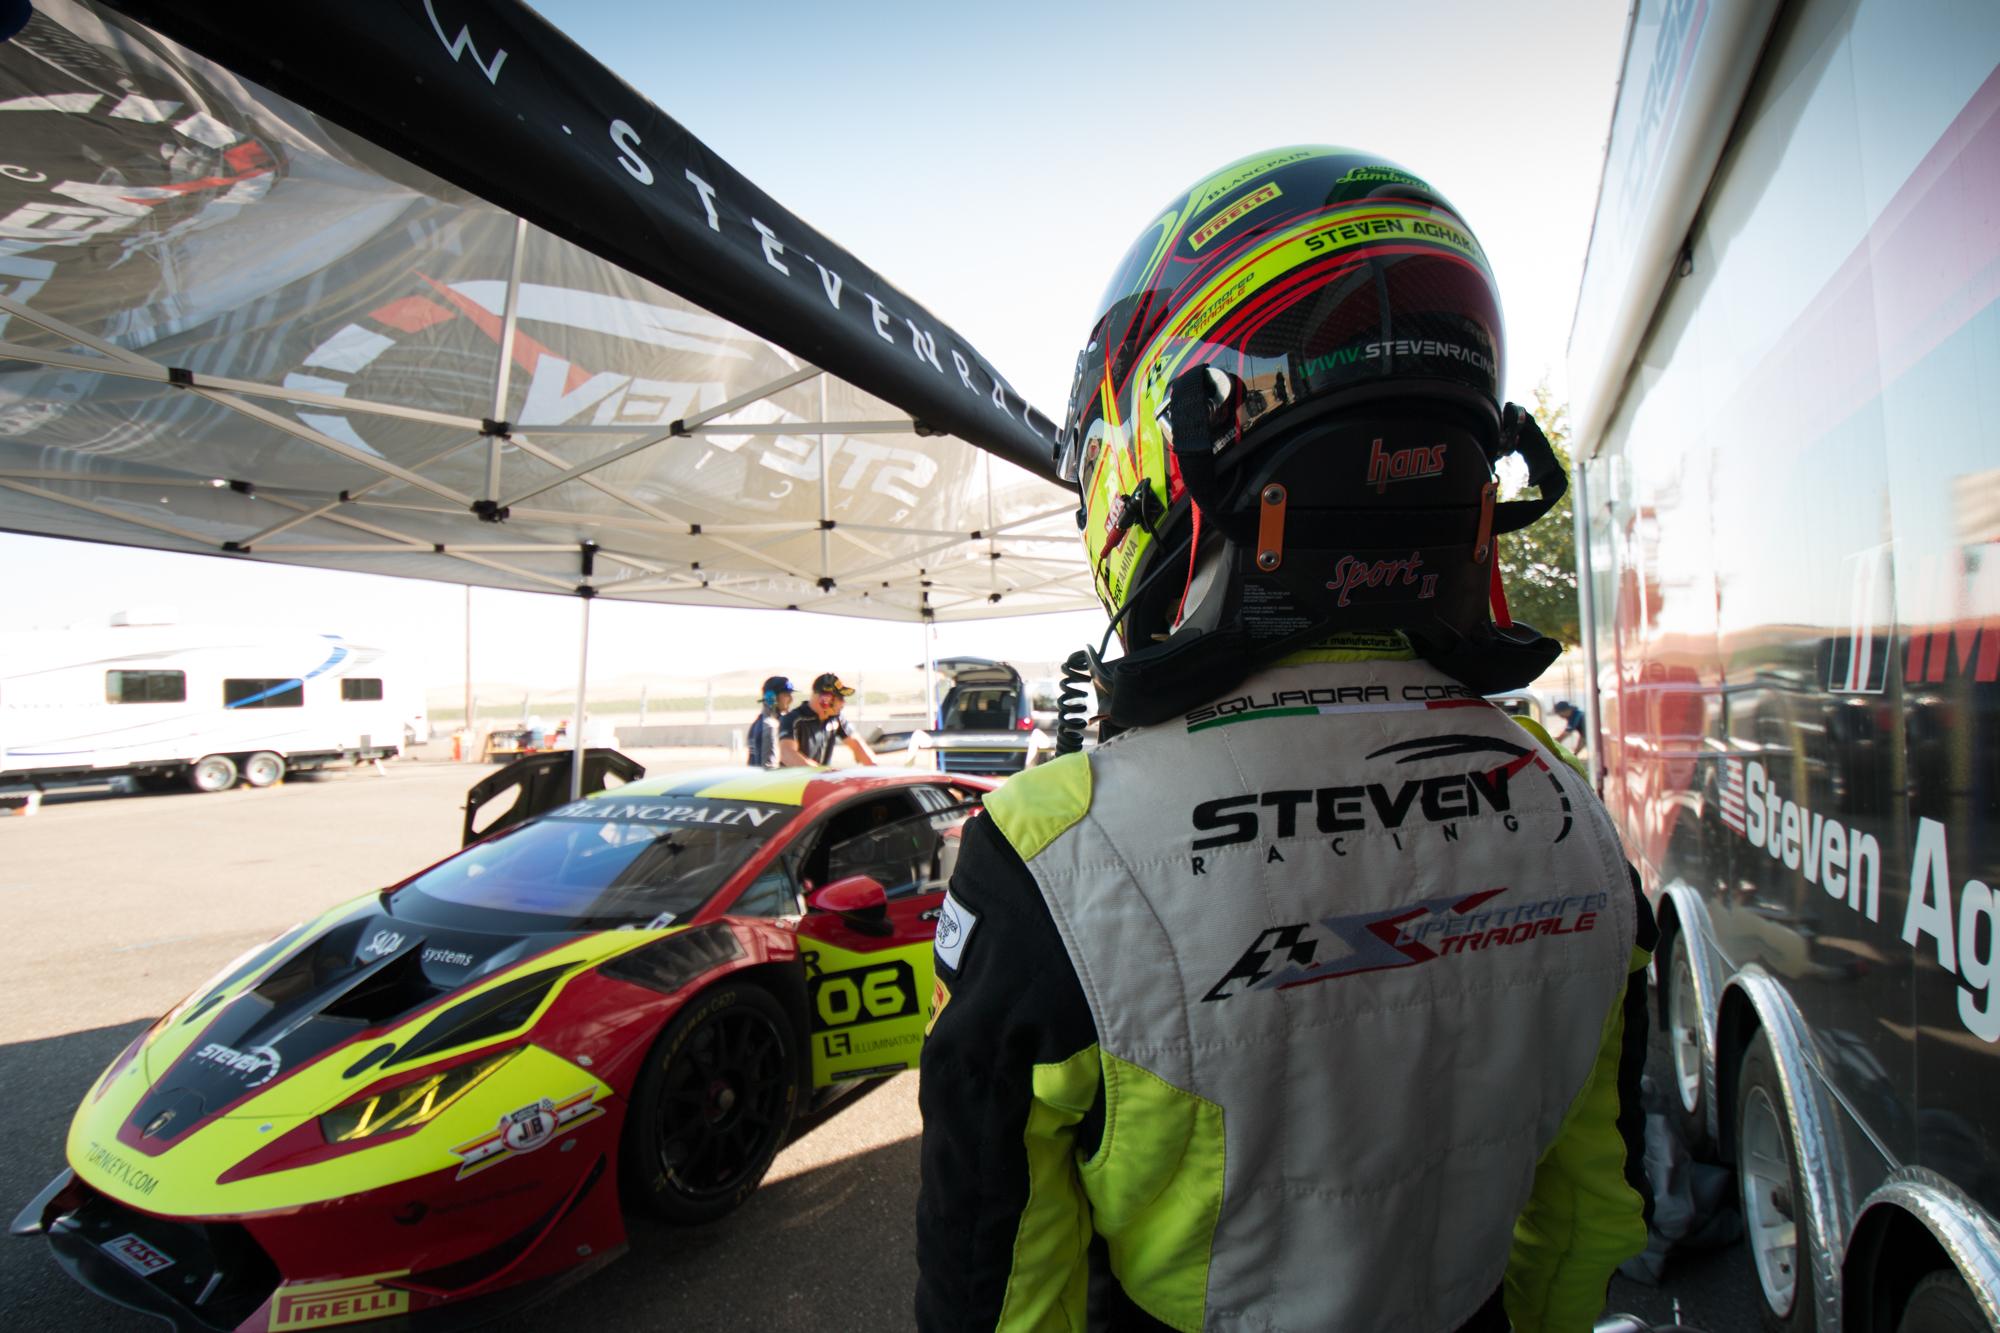 Steven-Racing-20130204-44710.jpg